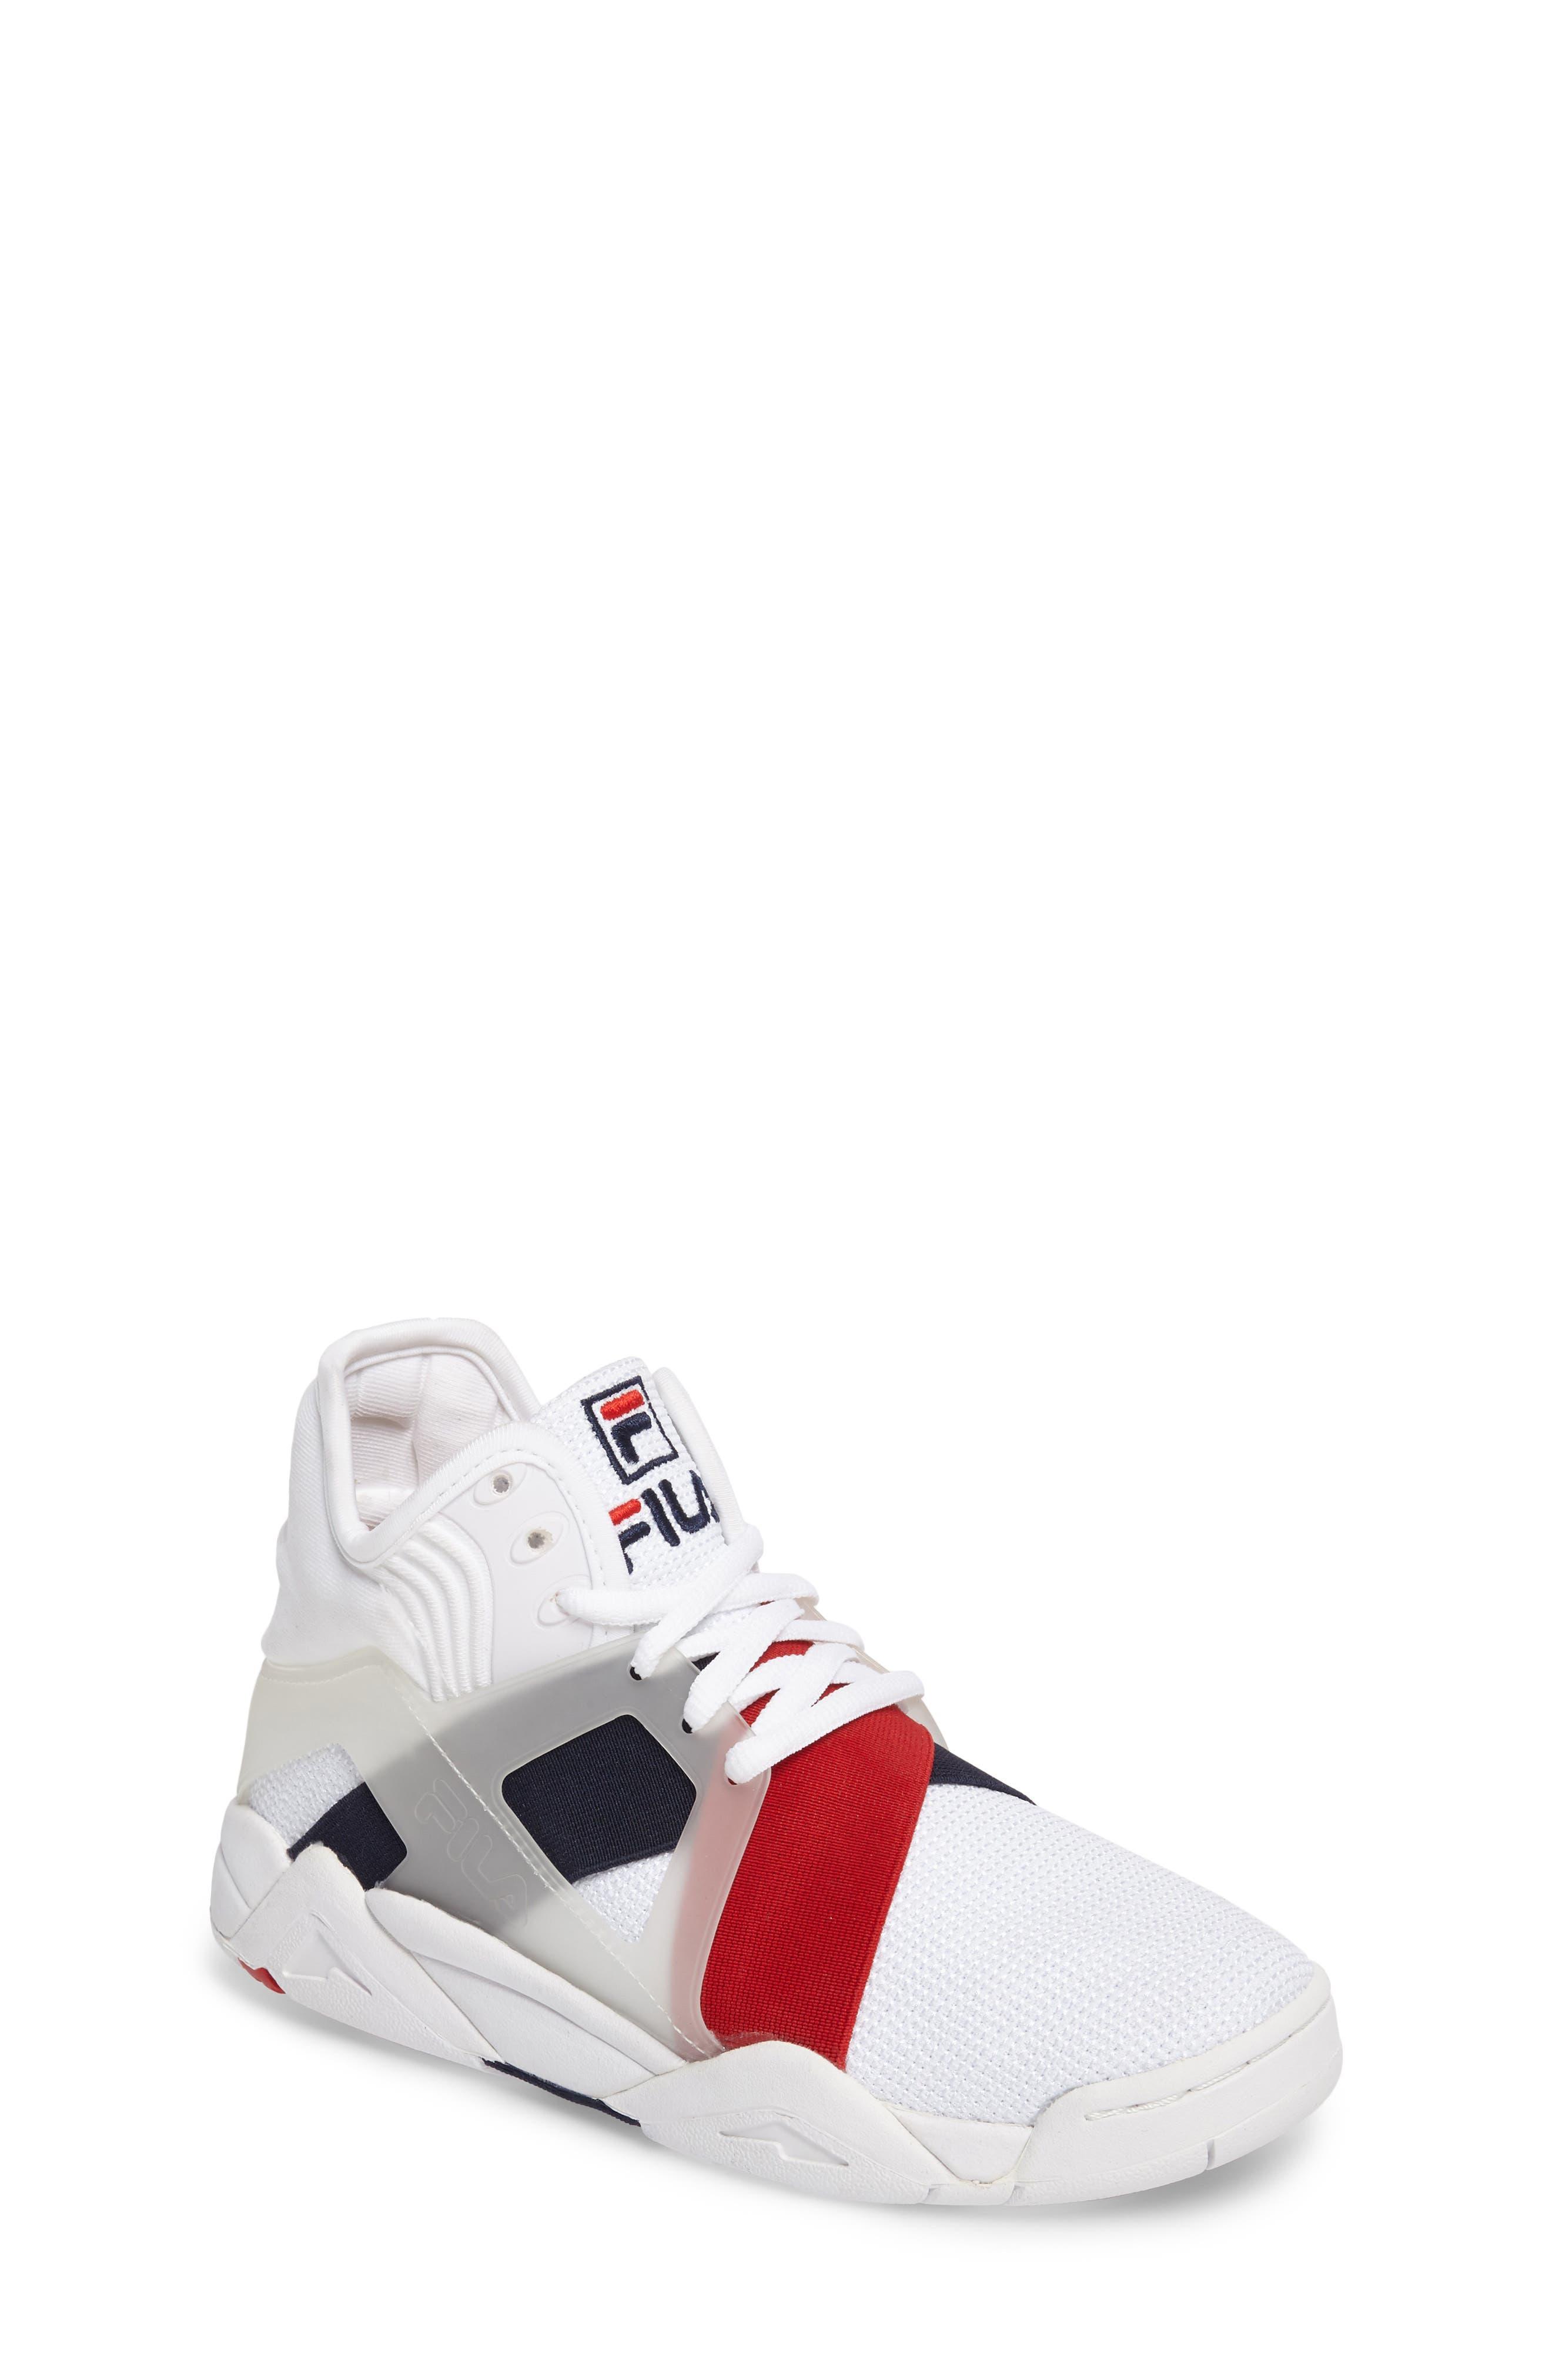 fila shoes fresh 321hiphop 2018 mustang